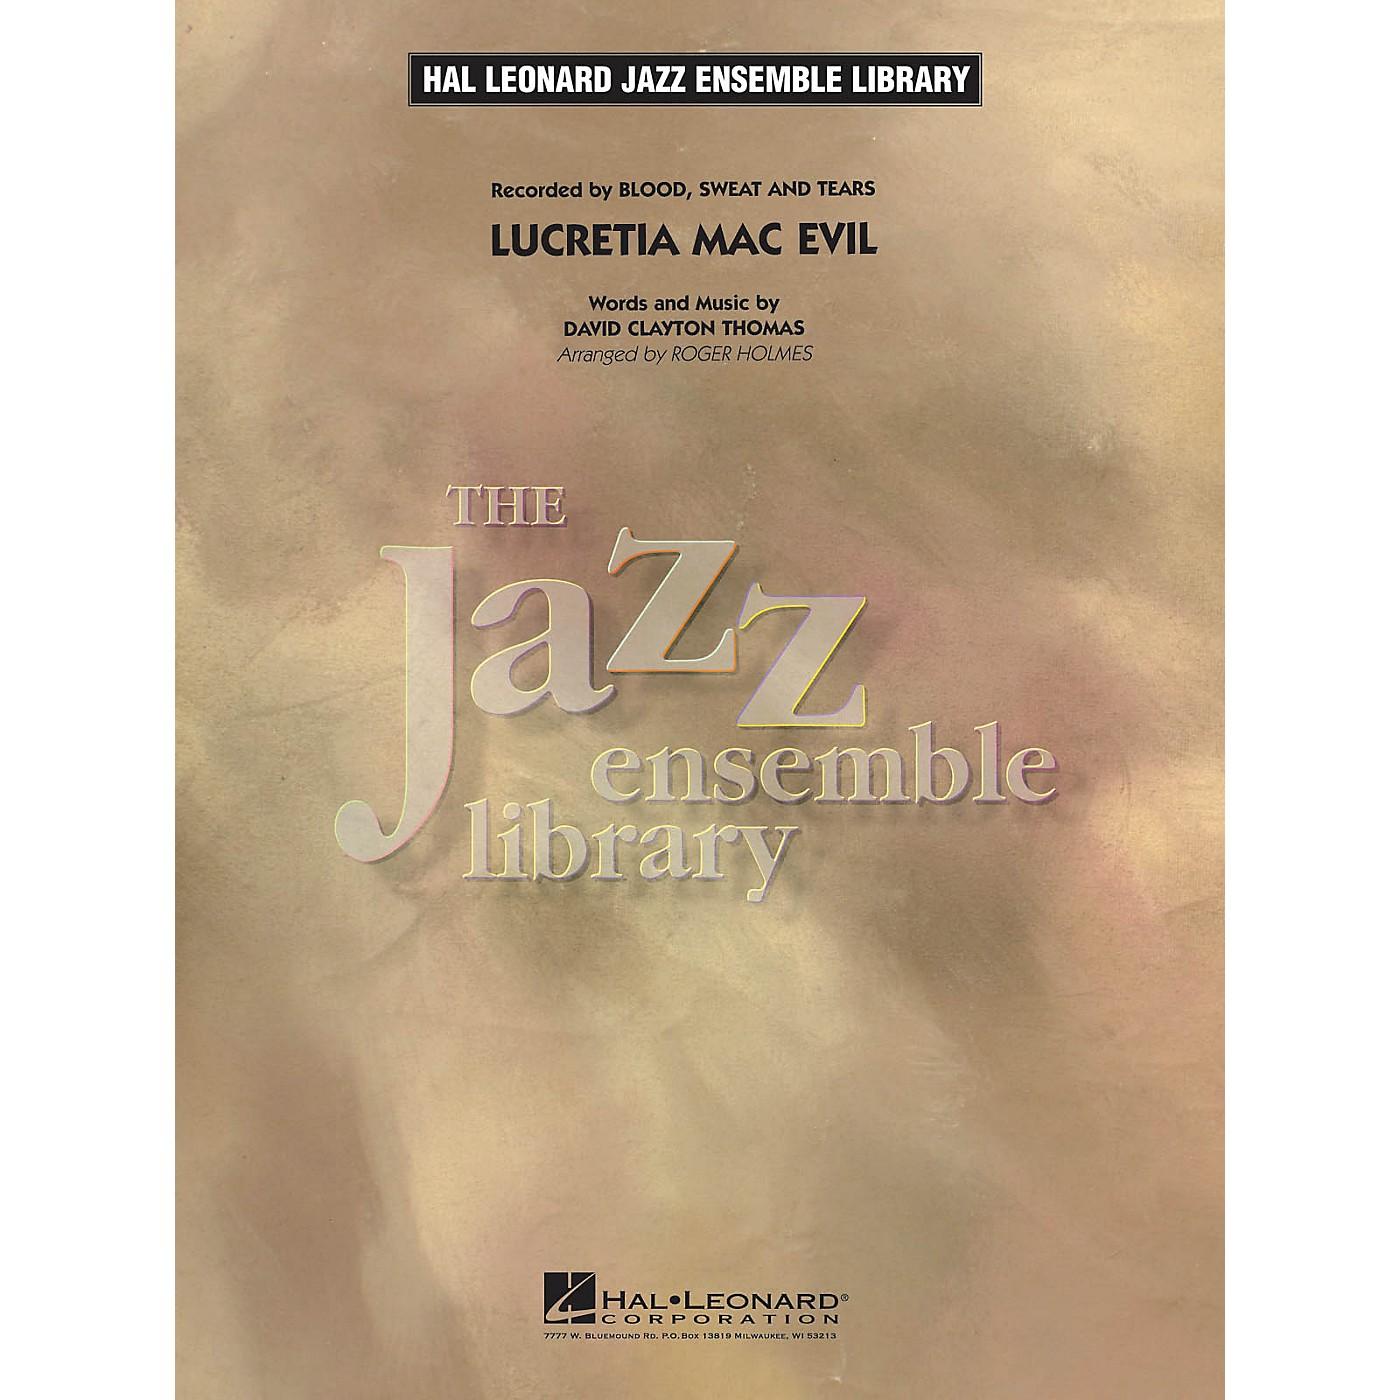 Hal Leonard Lucretia Mac Evil Jazz Band Level 4 by Blood, Sweat & Tears Arranged by Roger Holmes thumbnail